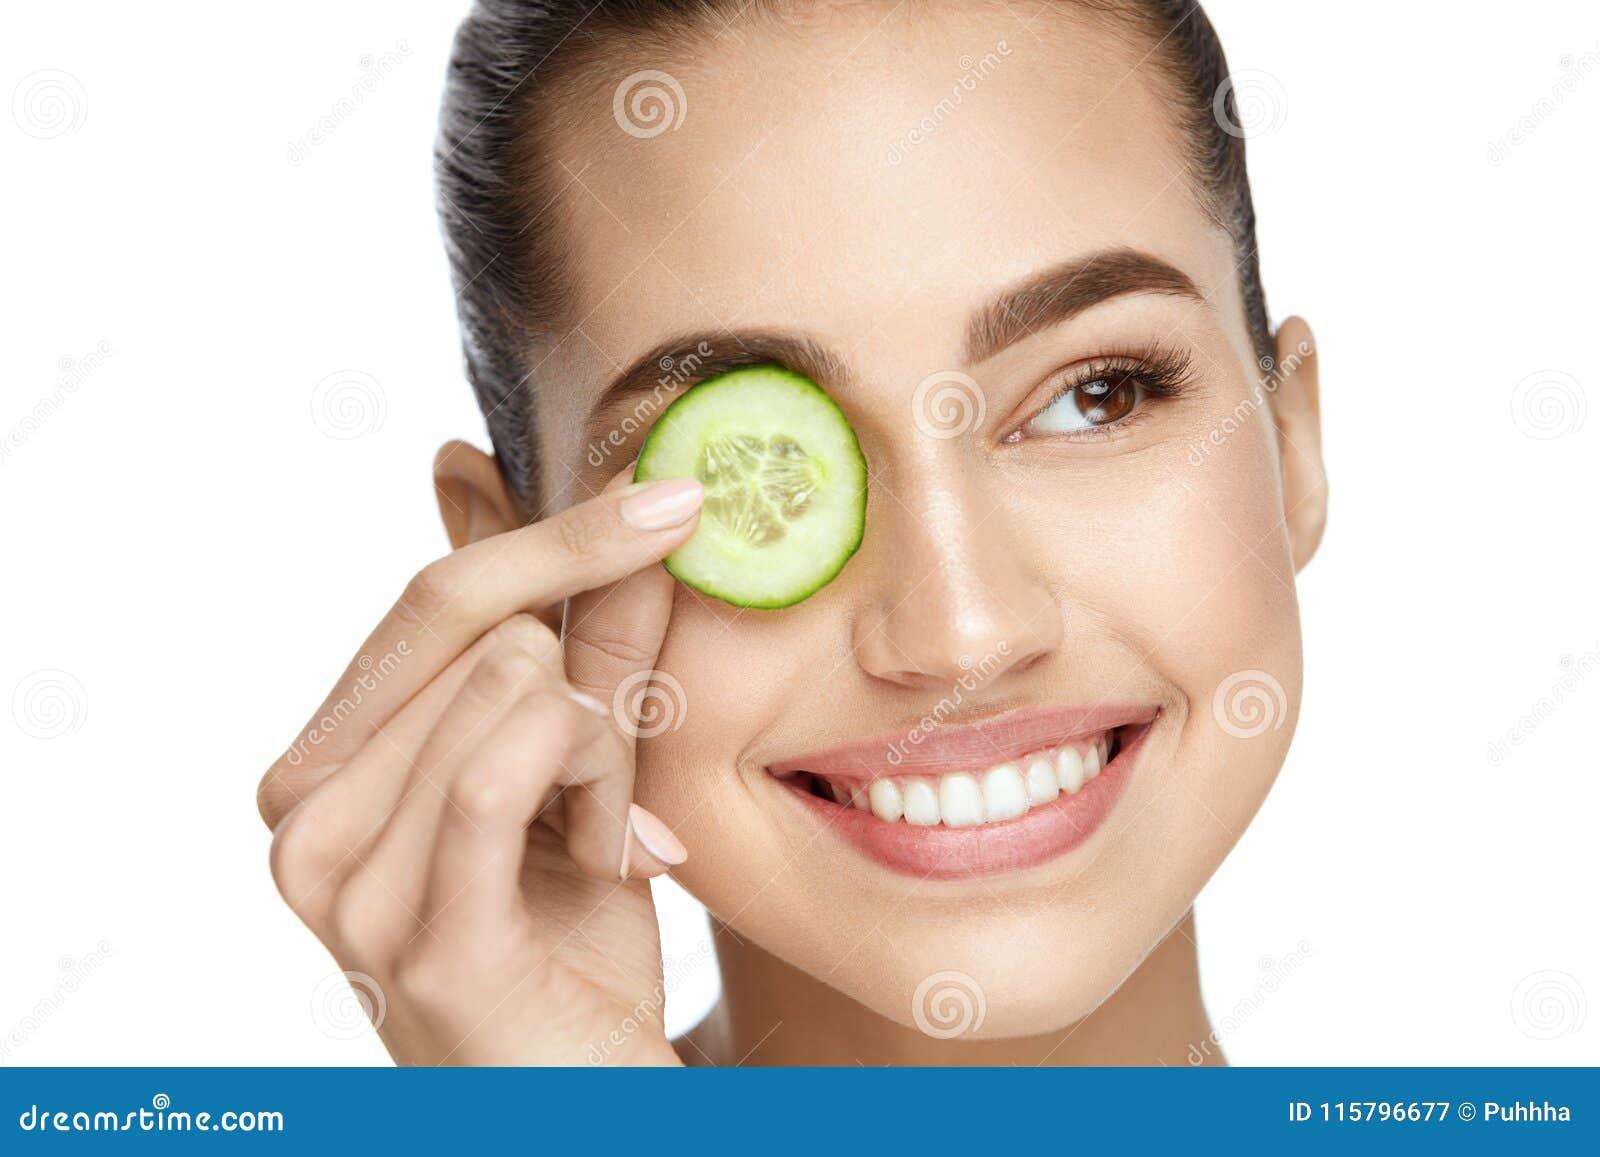 Girl using cucumber